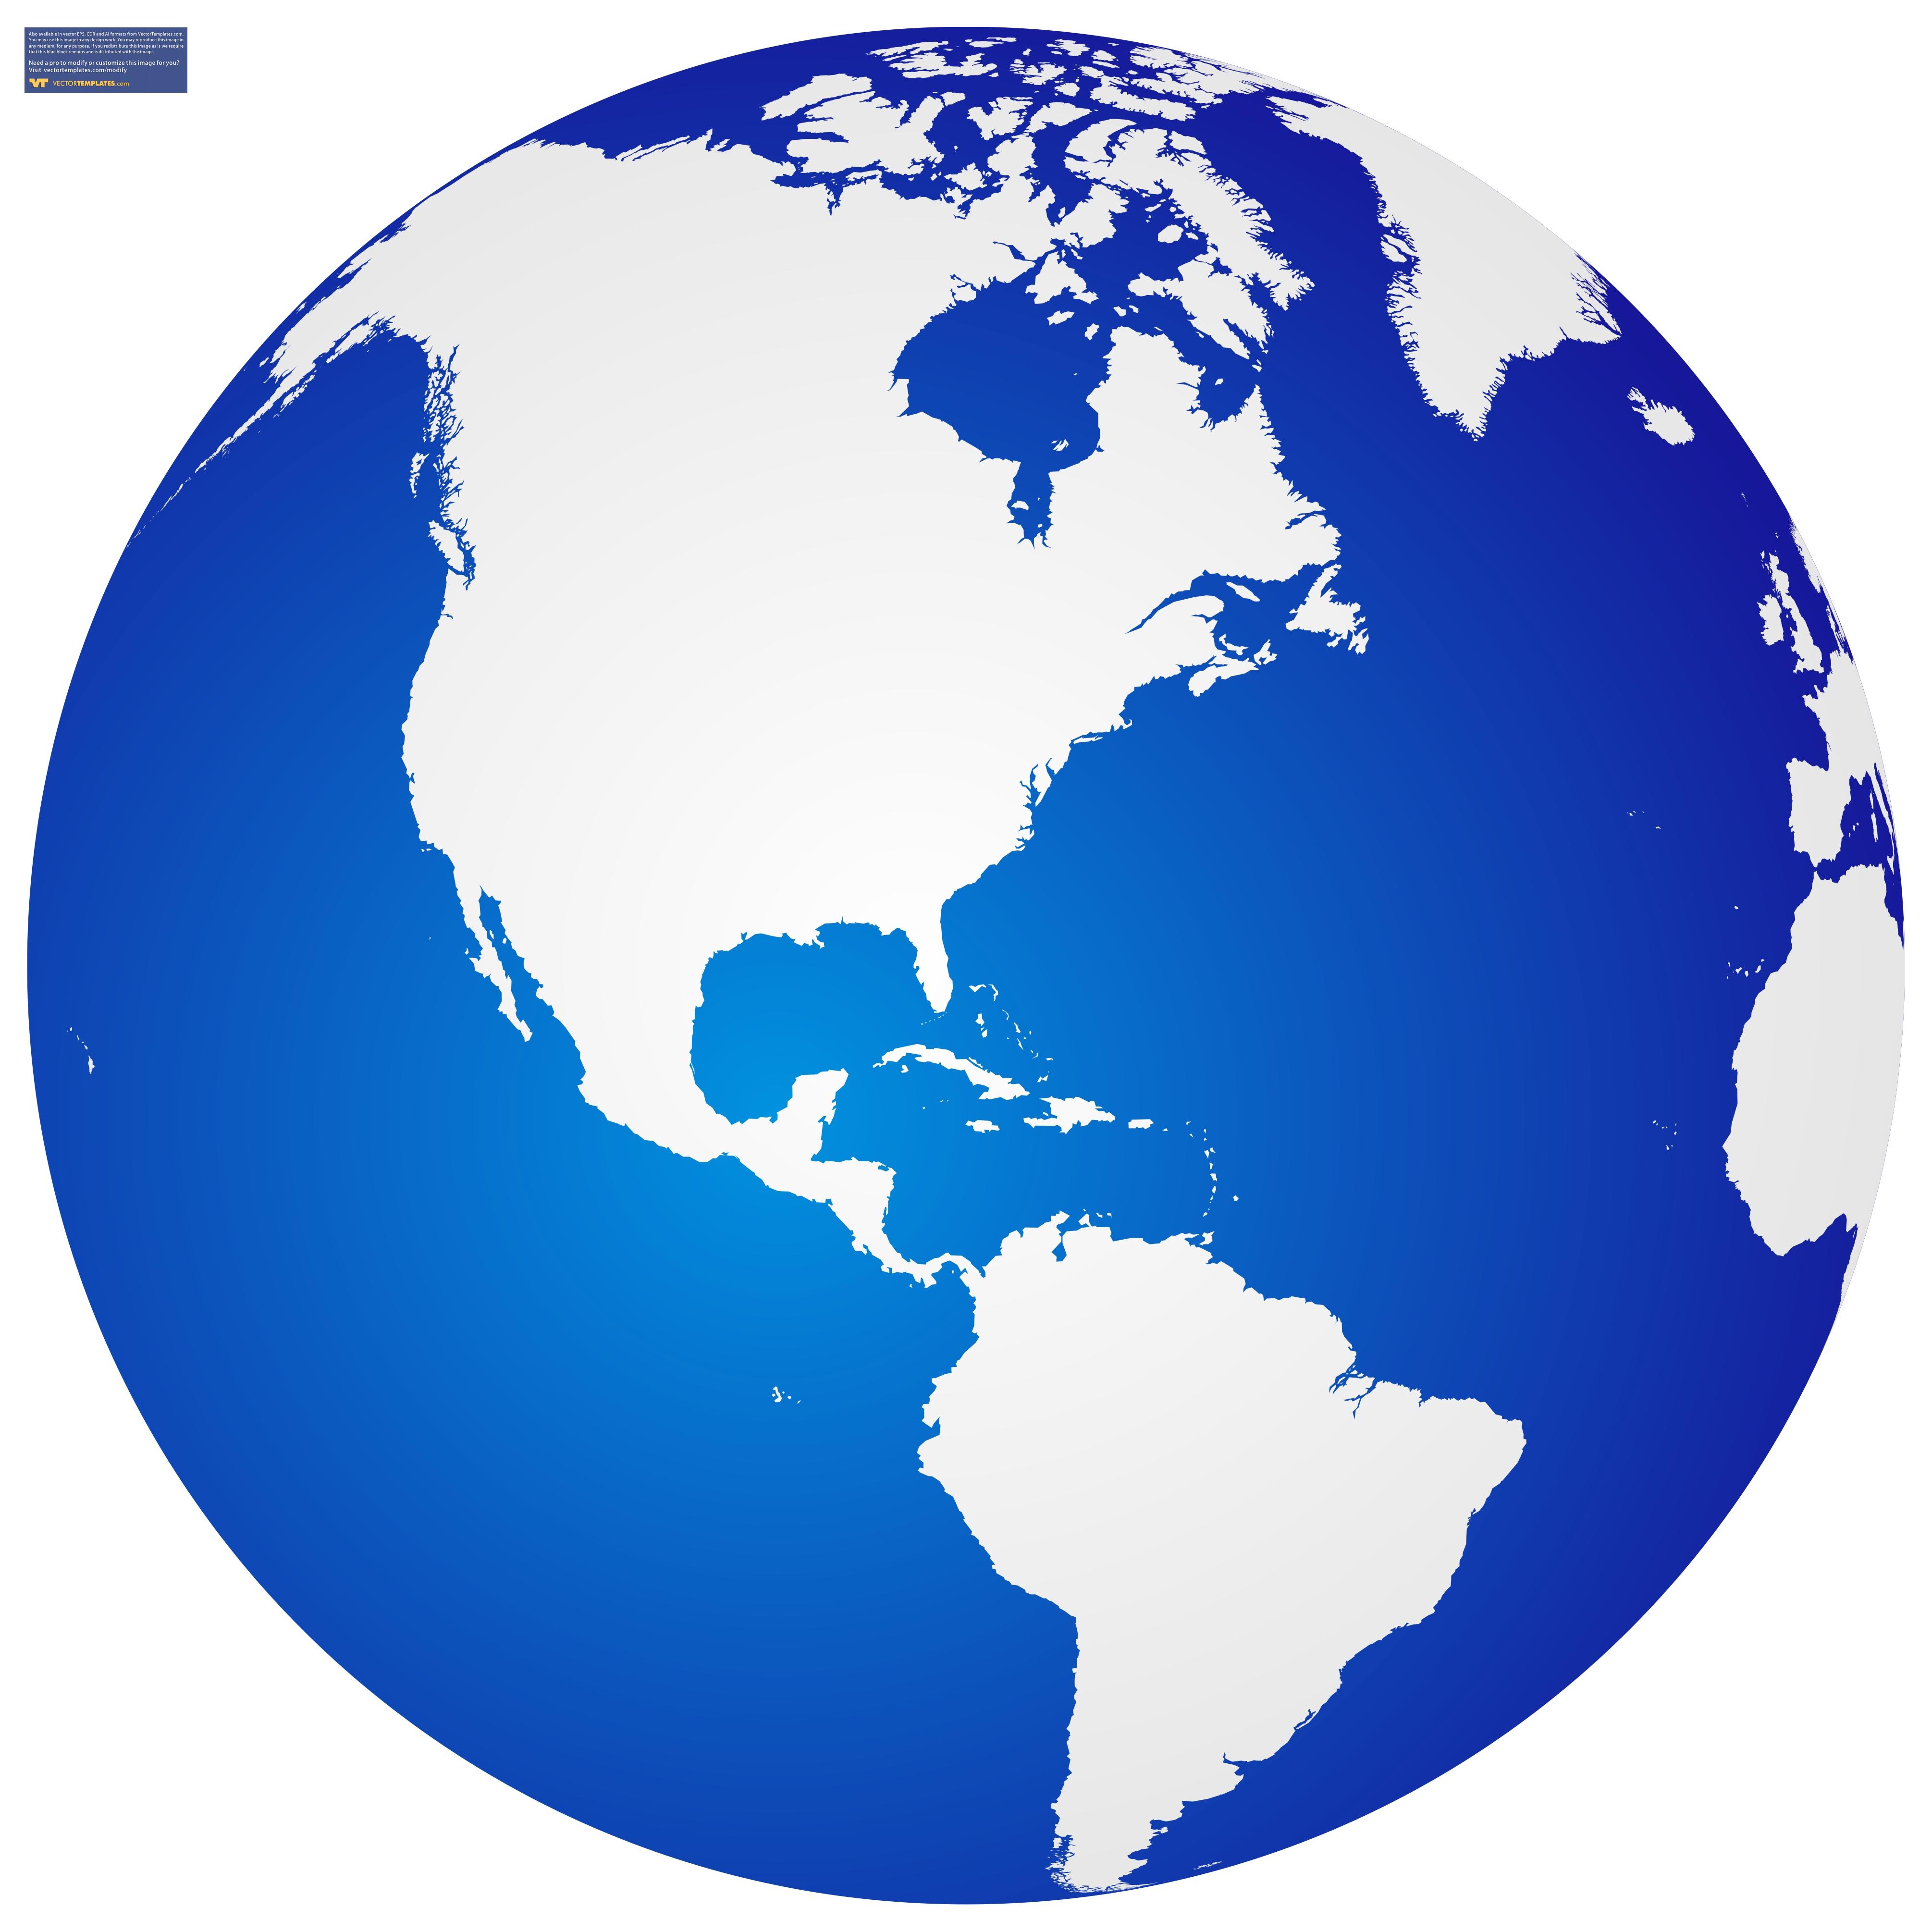 4021x4021 > Globe Wallpapers